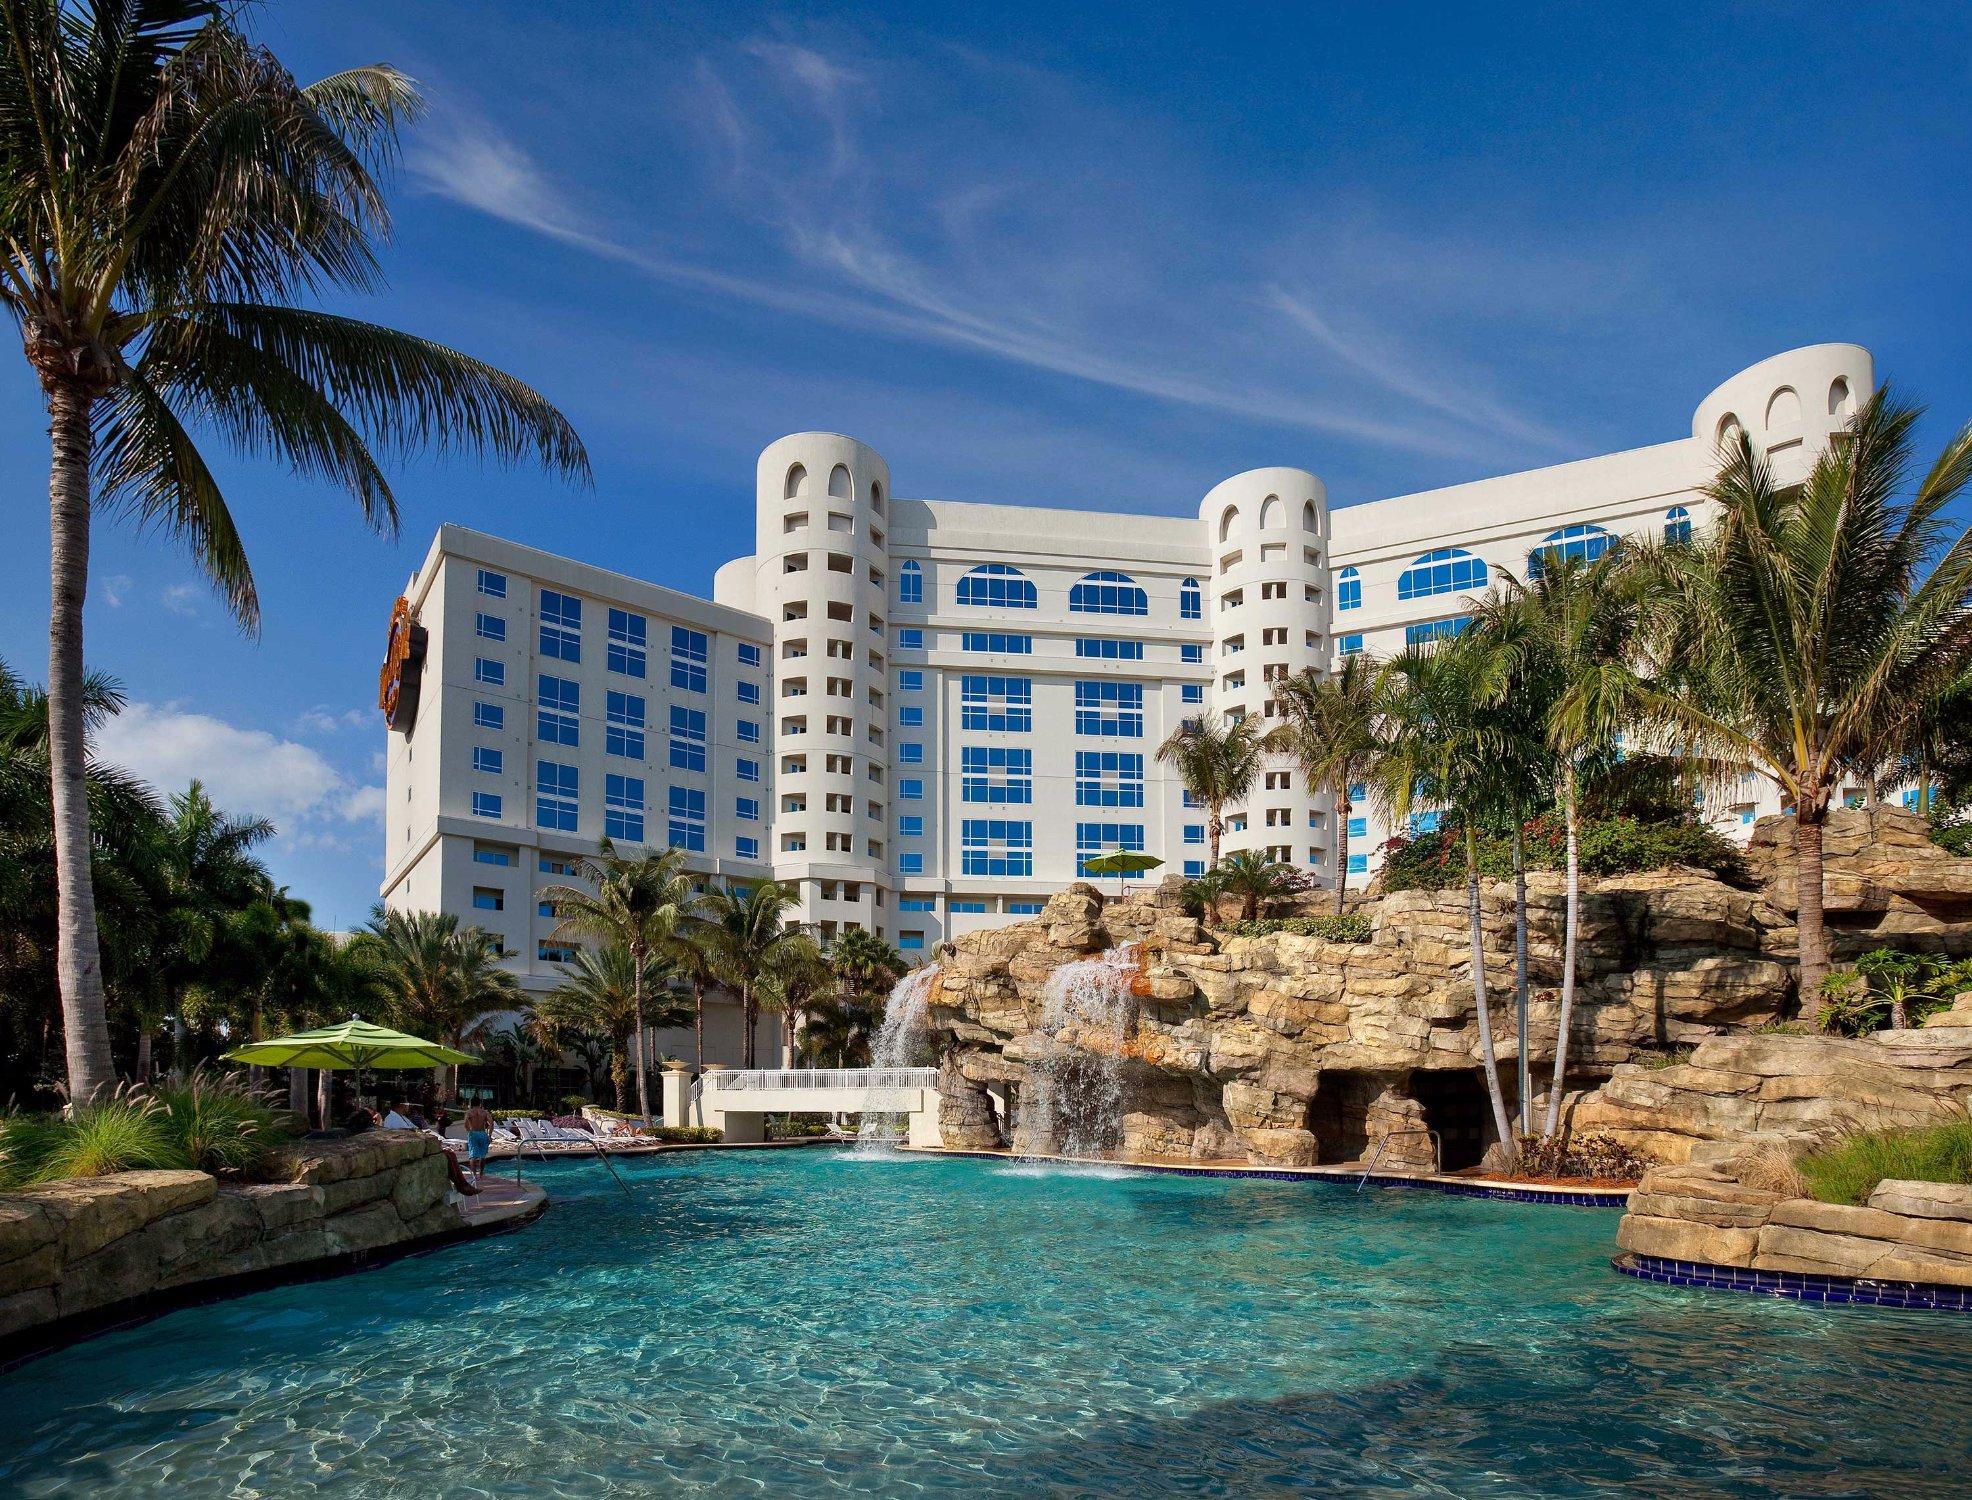 Seminole hollywood casino arcanum gambling apprentice training